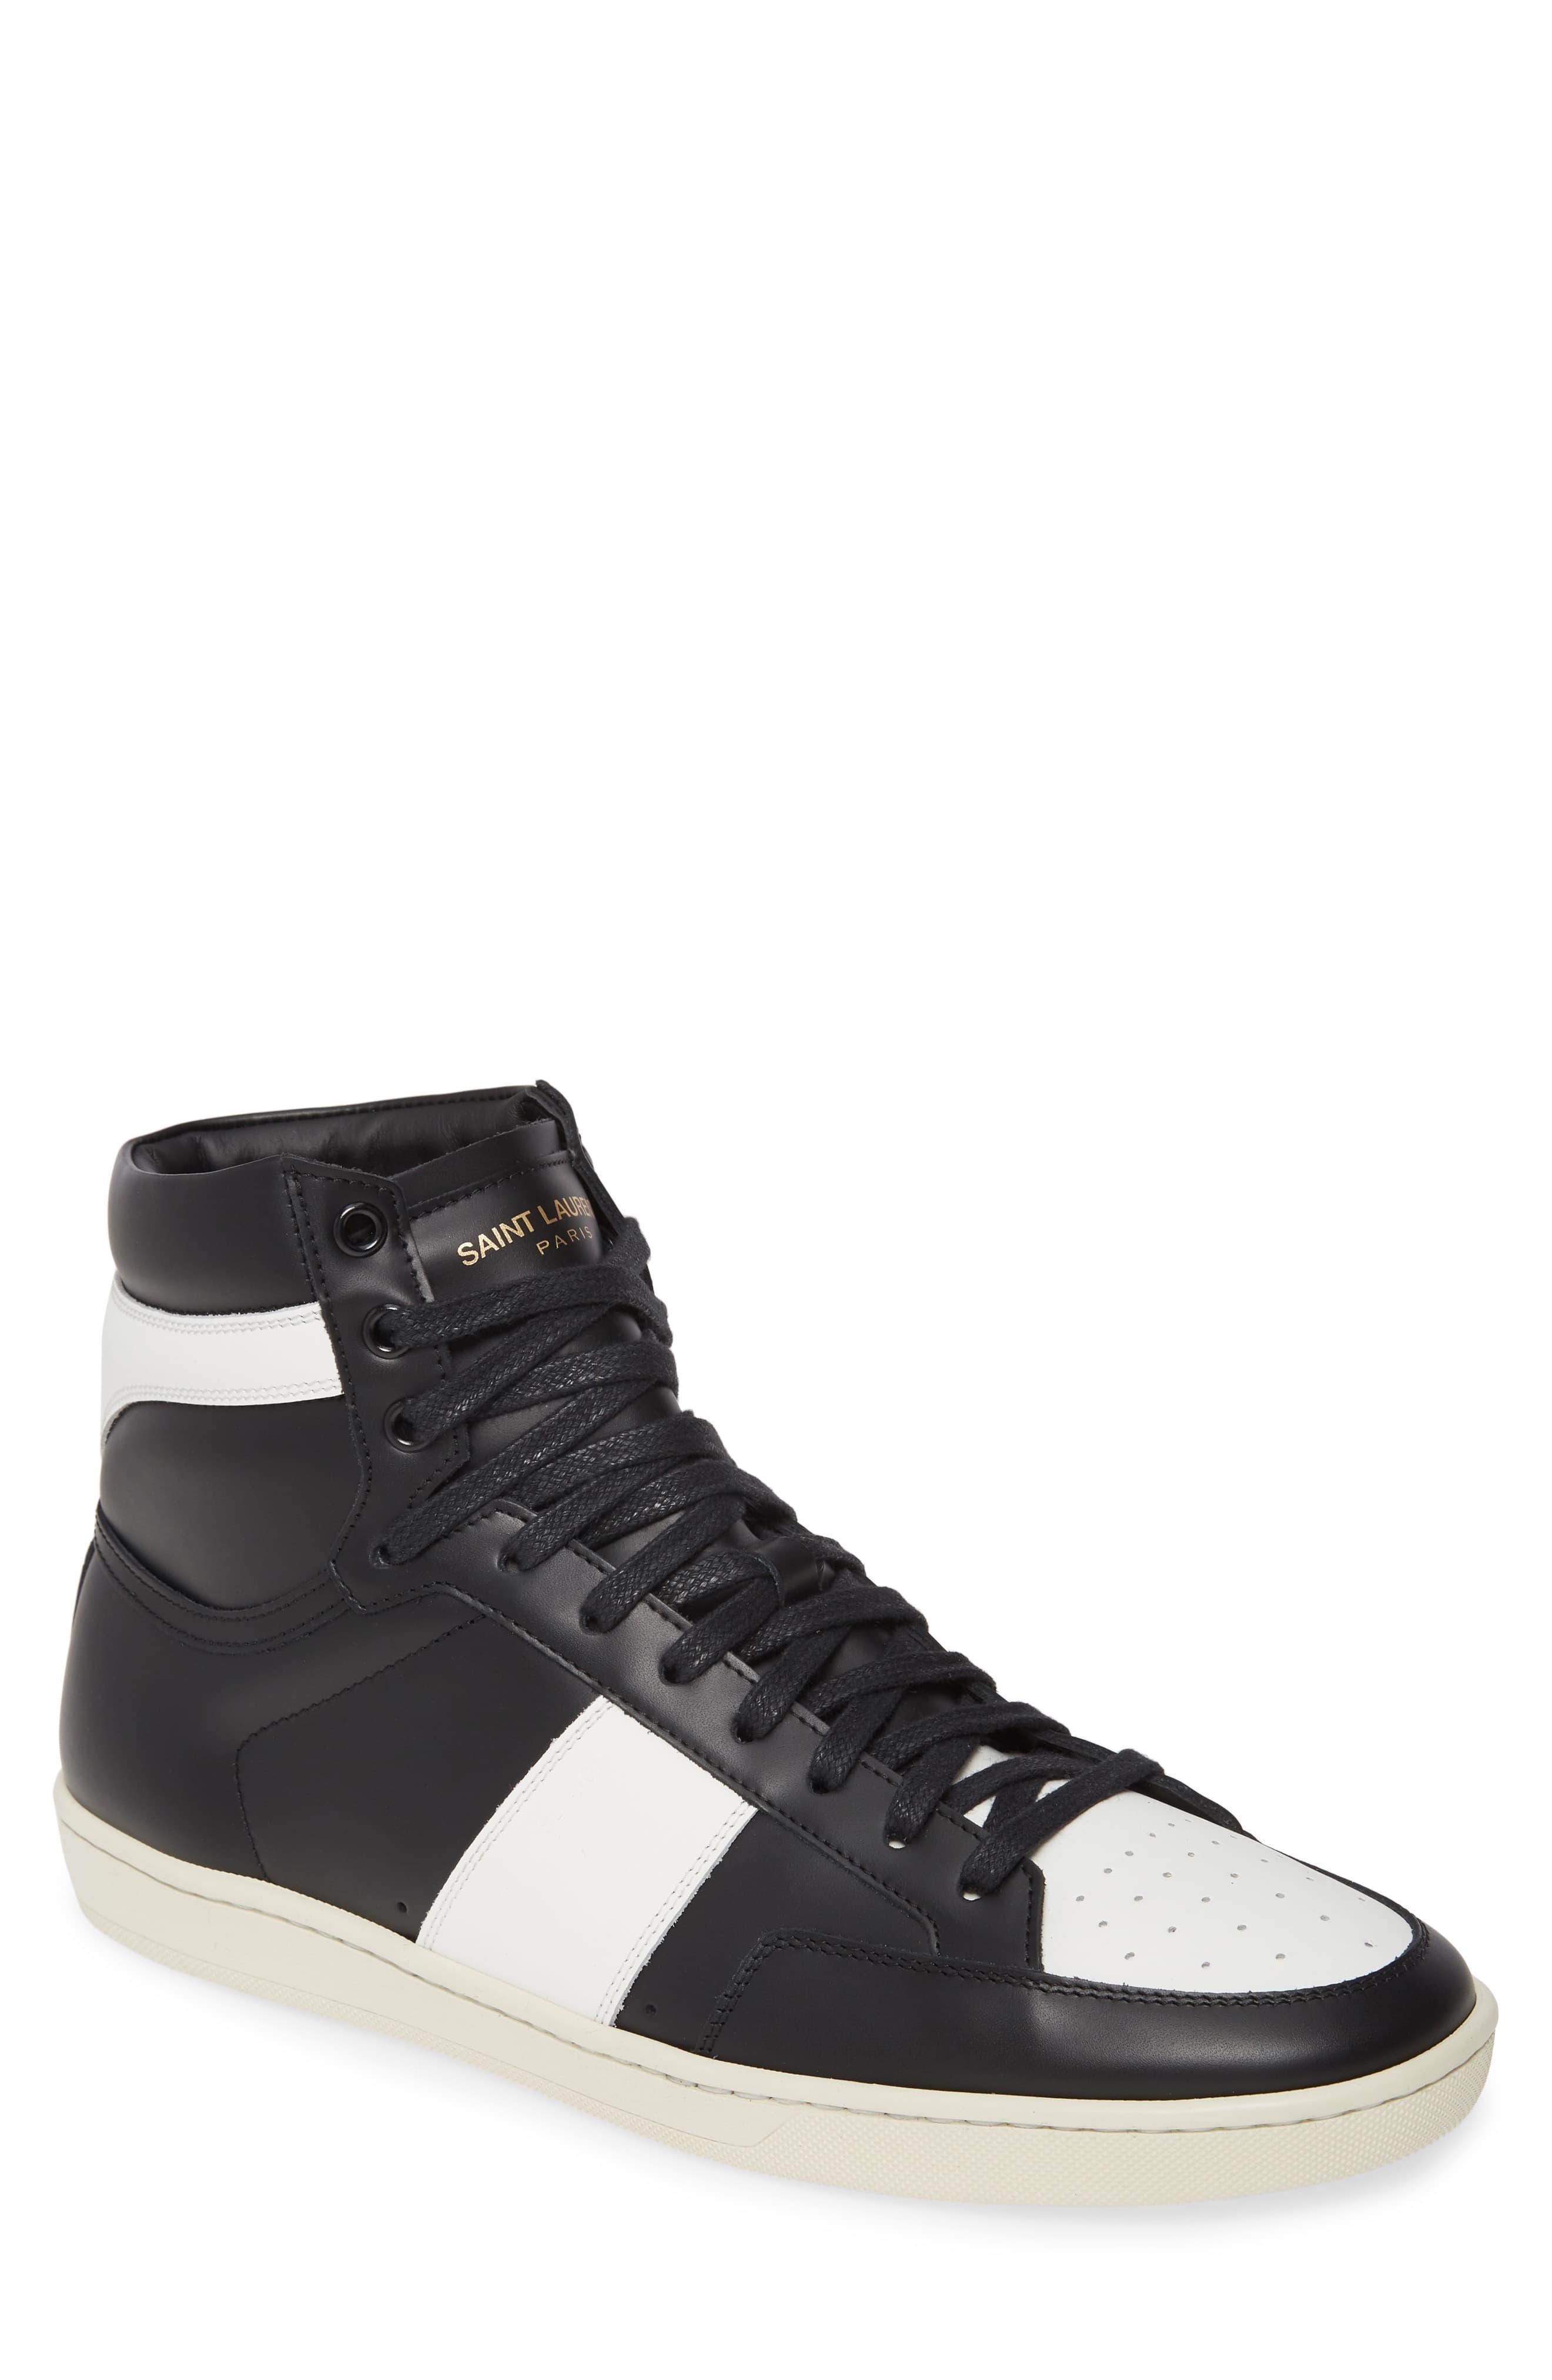 0362841ca5b Men's Saint Laurent Sl/10H Signature Court Classic High-Top Sneaker, Size  7US / 40EU – White